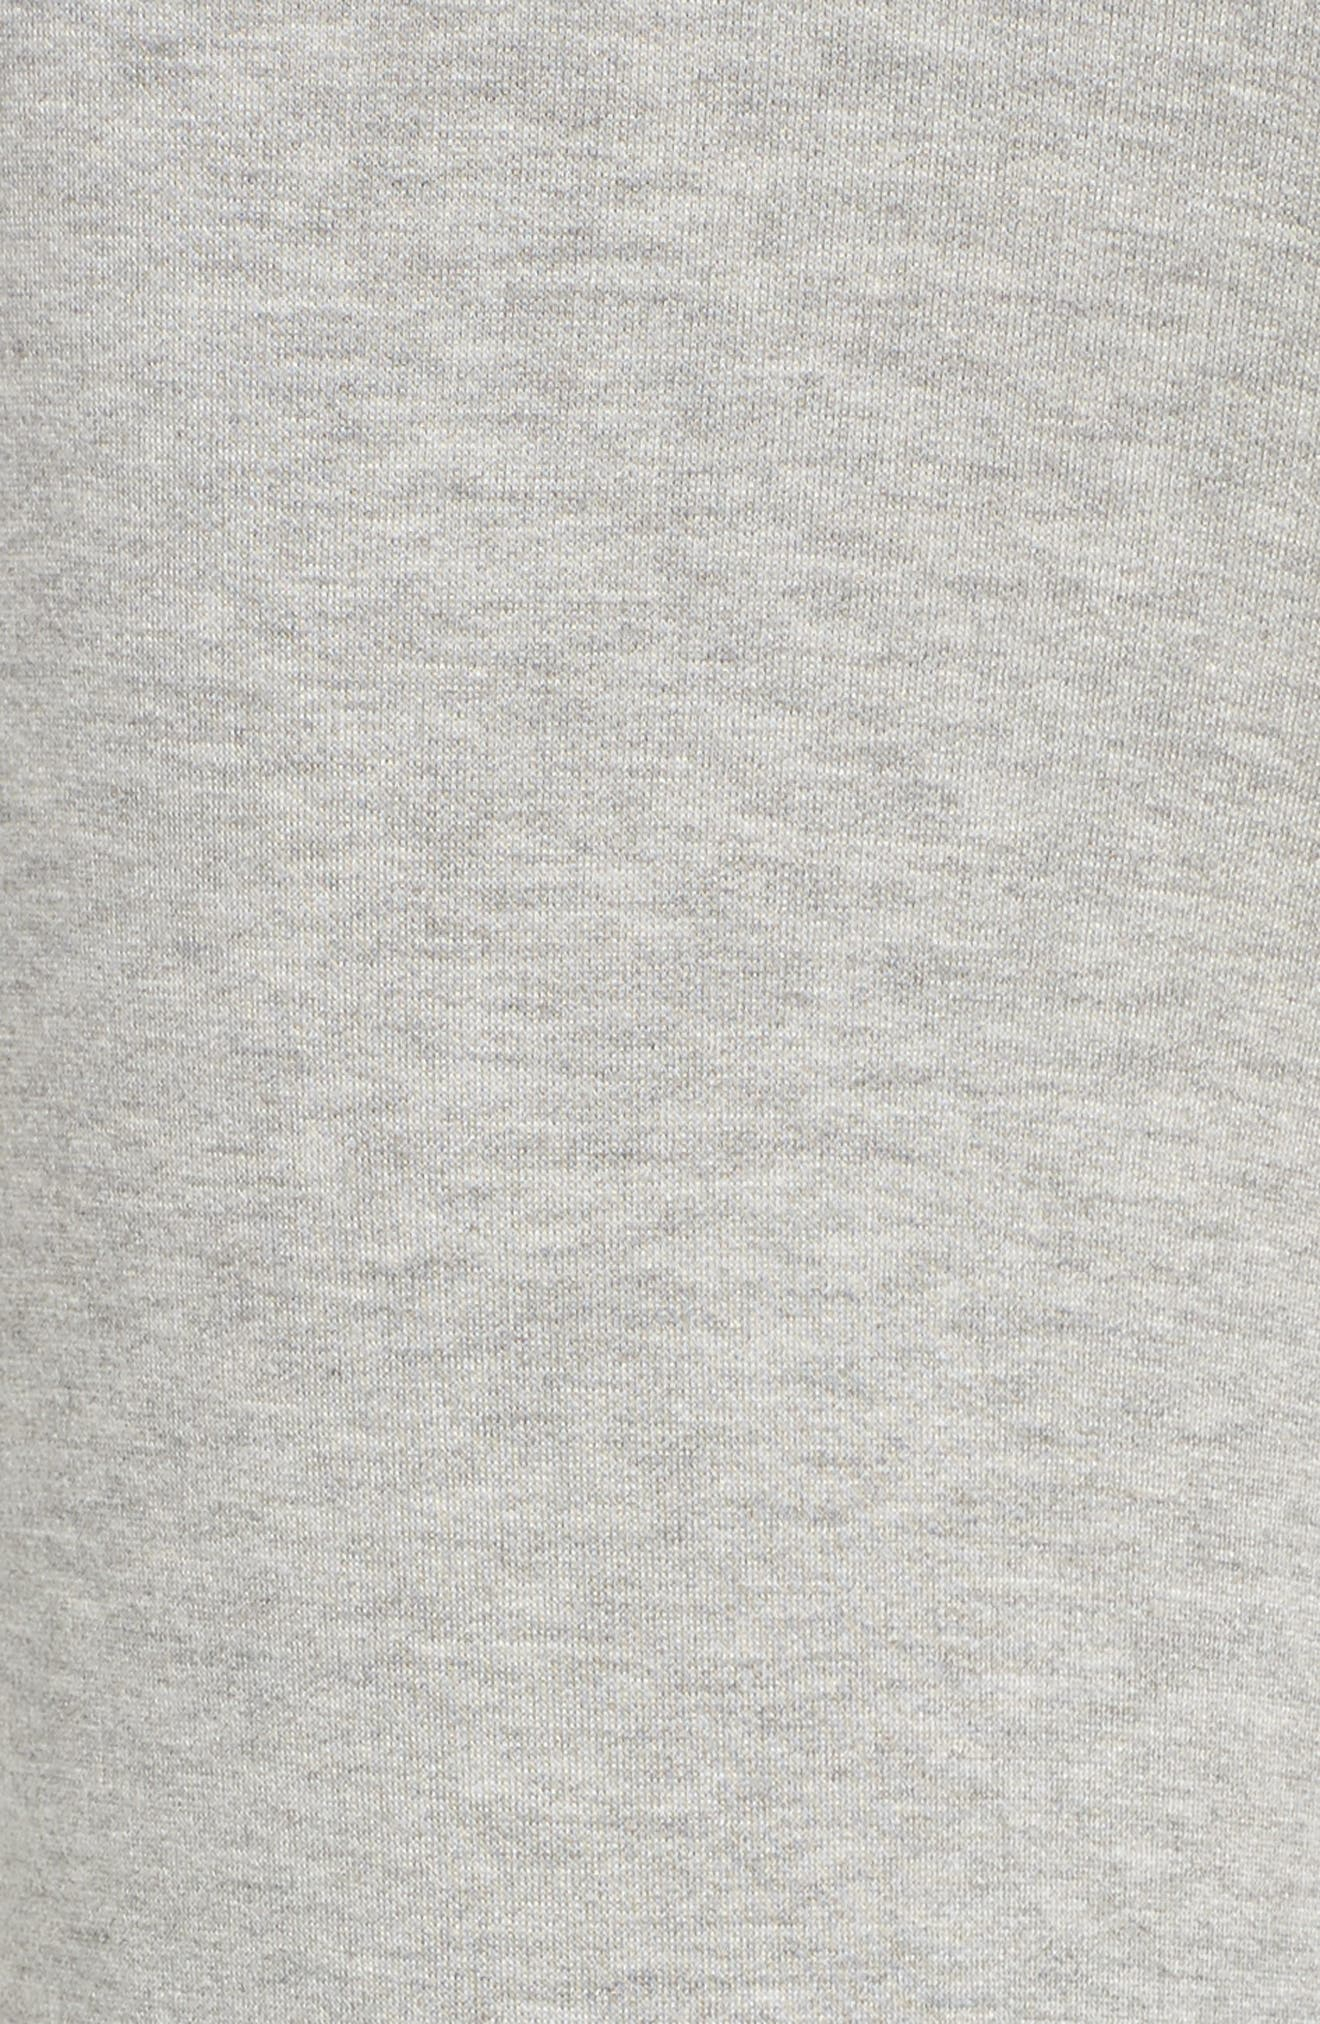 Runway Culotte Sweatpants,                             Alternate thumbnail 6, color,                             020